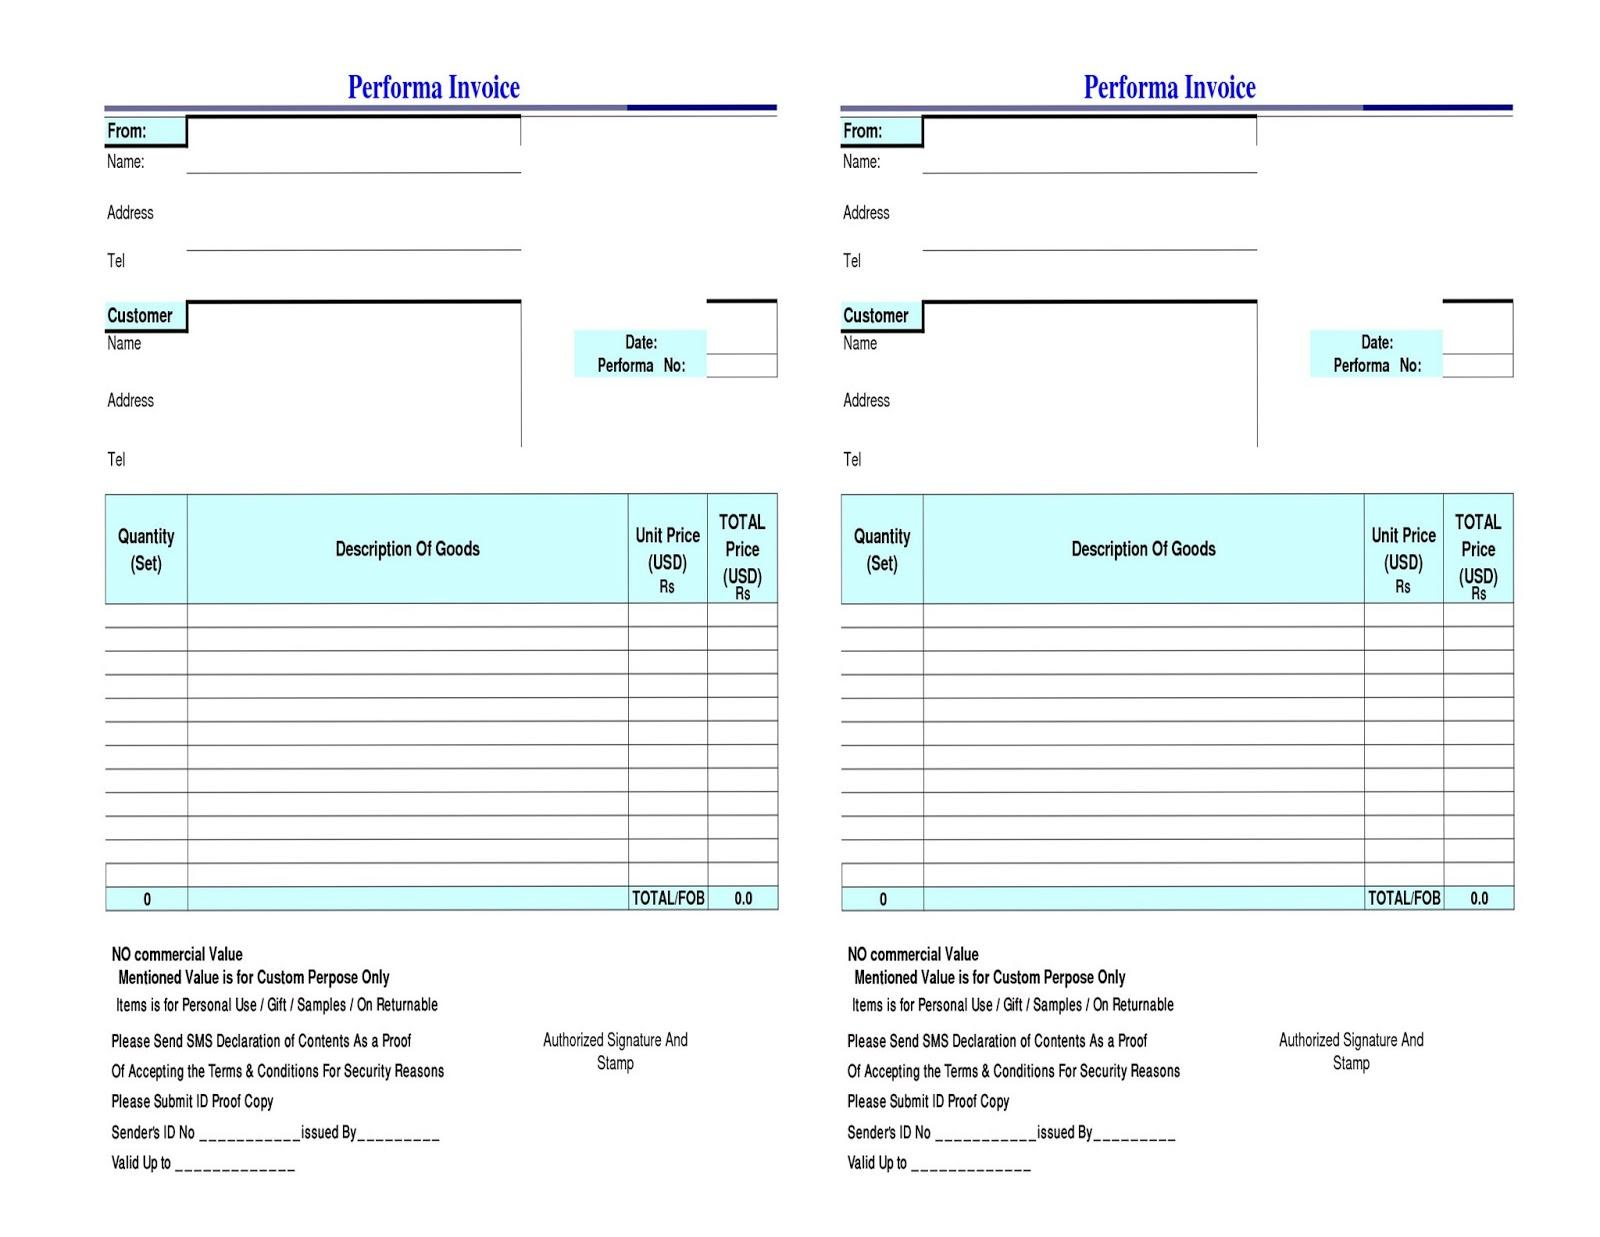 courier declaration courier declaration for document parcel non commercial shipment gift shipment sample shipment un insured shimment